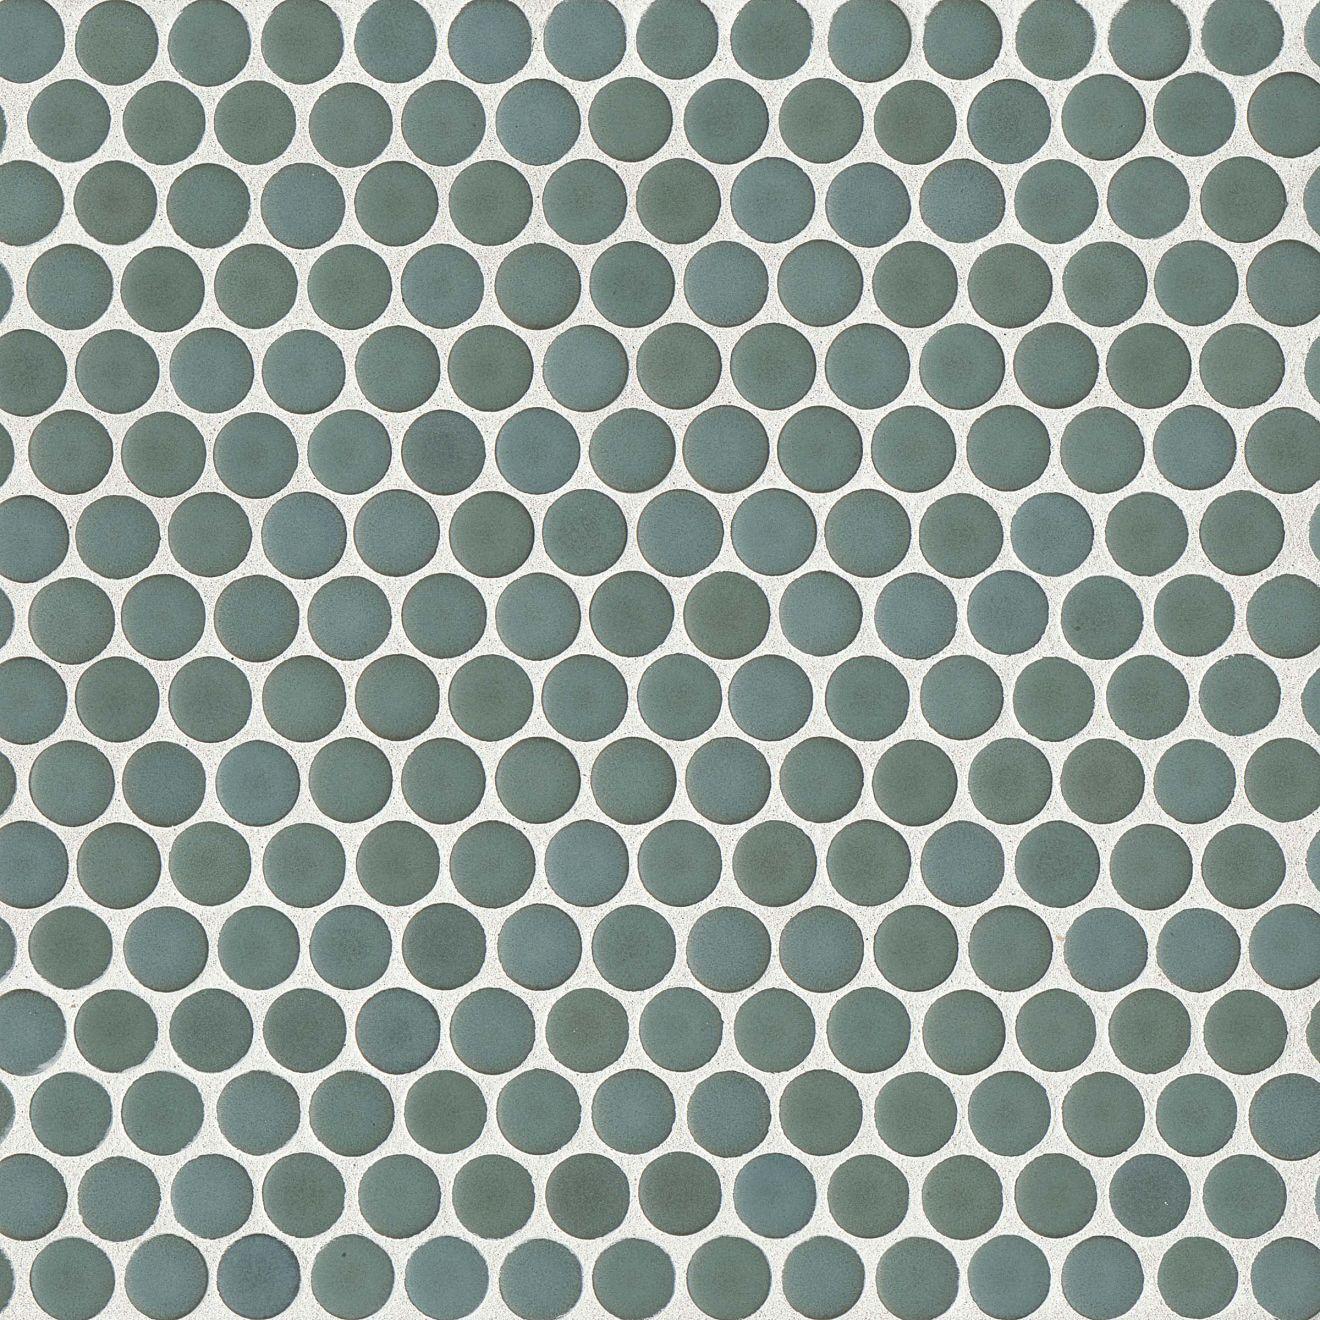 "360 3/4"" x 3/4"" Floor & Wall Mosaic in Silver Sage"